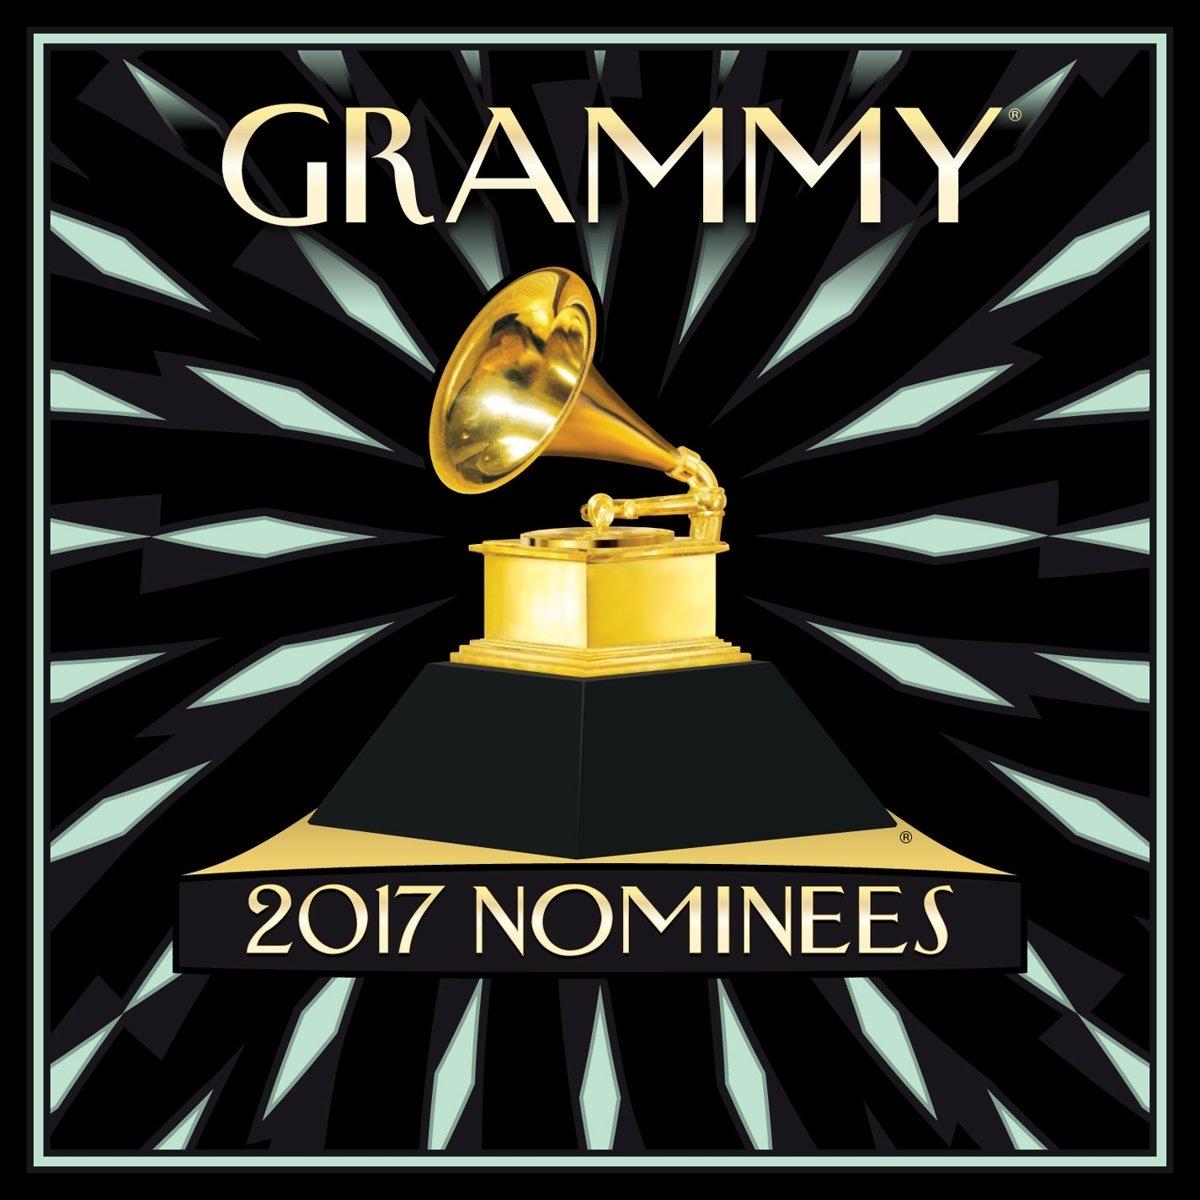 Buy 2017 Grammy Nominees Now!